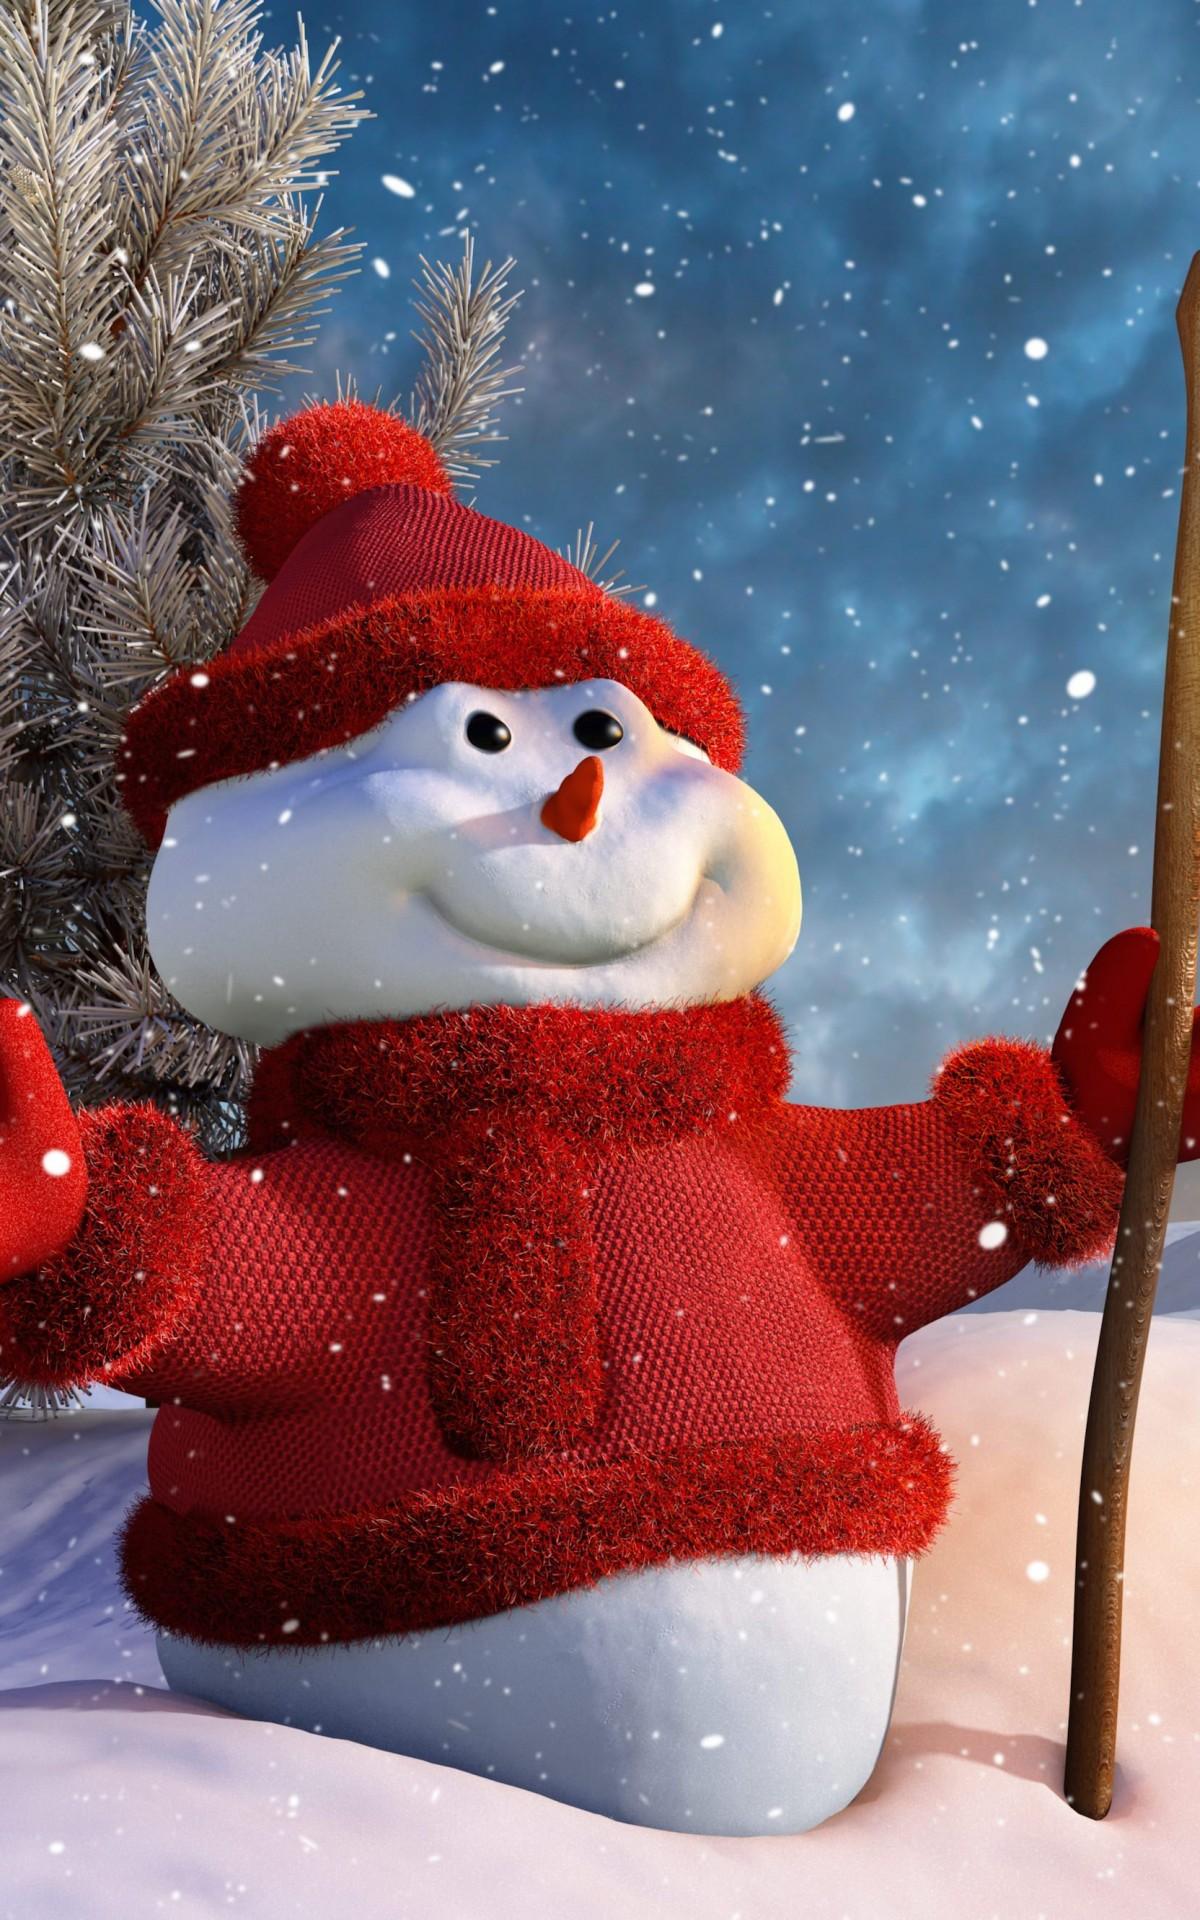 Christmas Snowman Wallpaper for Amazon Kindle Fire HDX 1200x1920